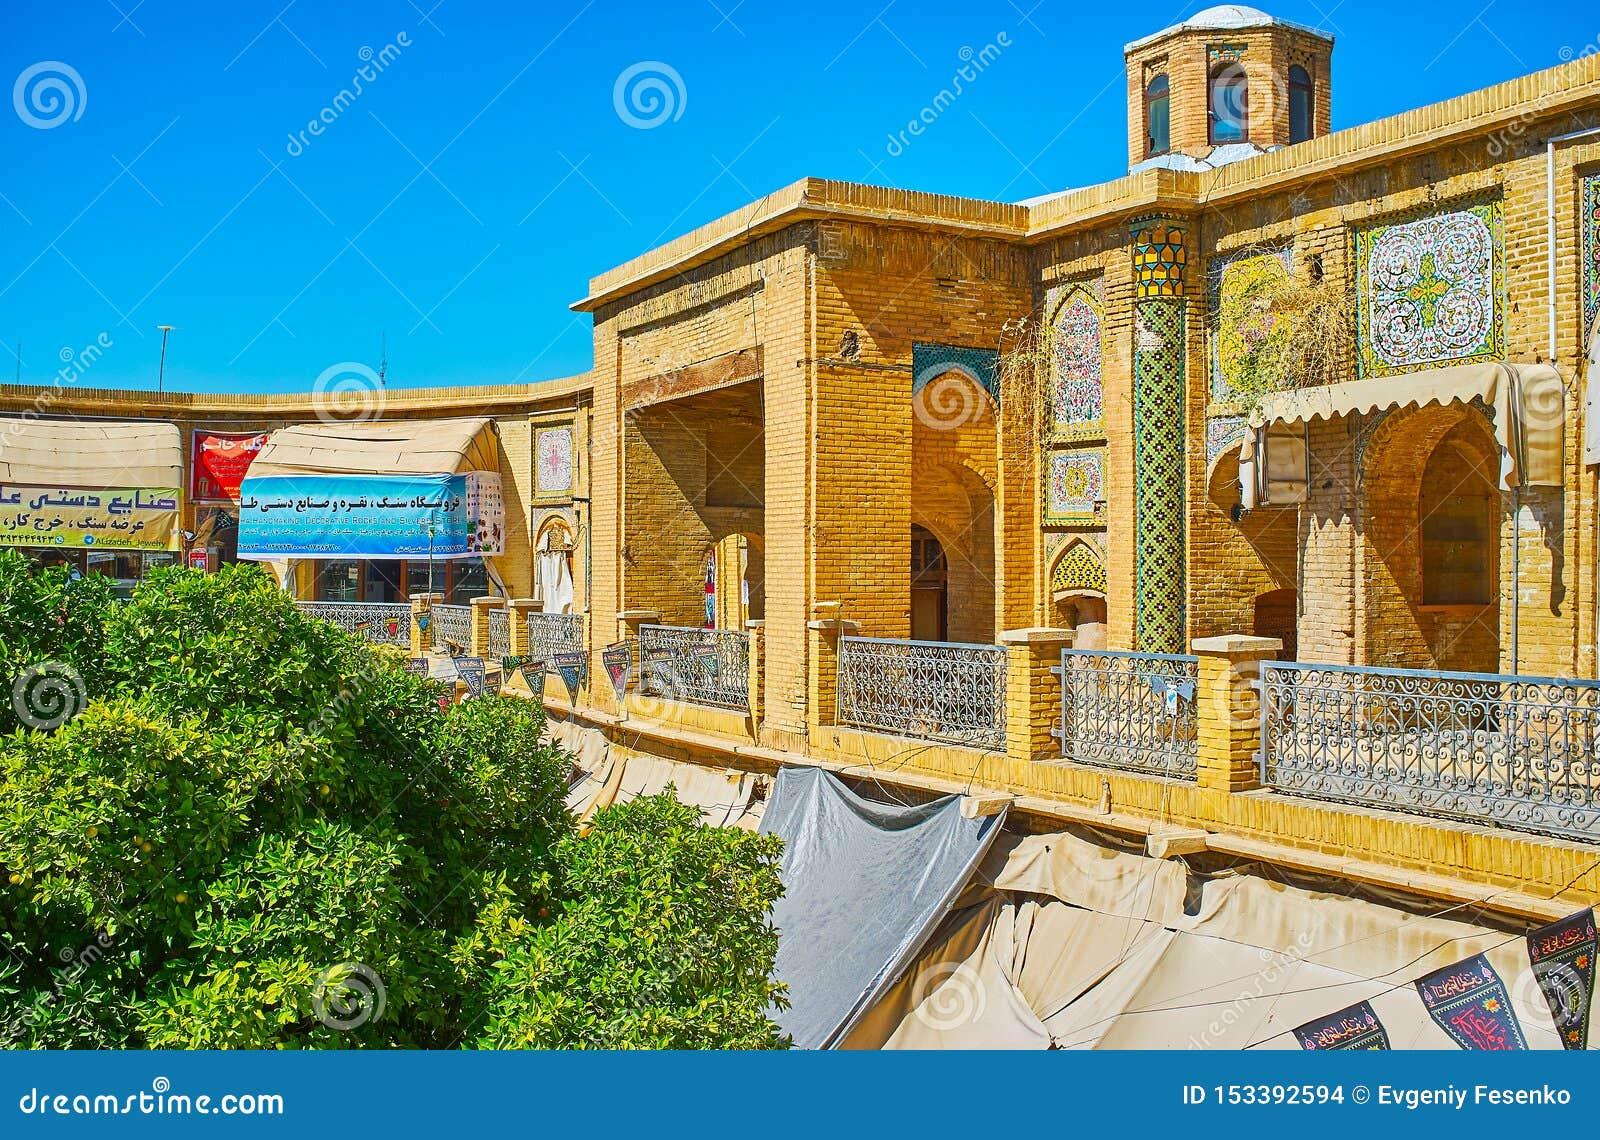 The portal of Saraye Moshir Bazaar, Shiraz, Iran